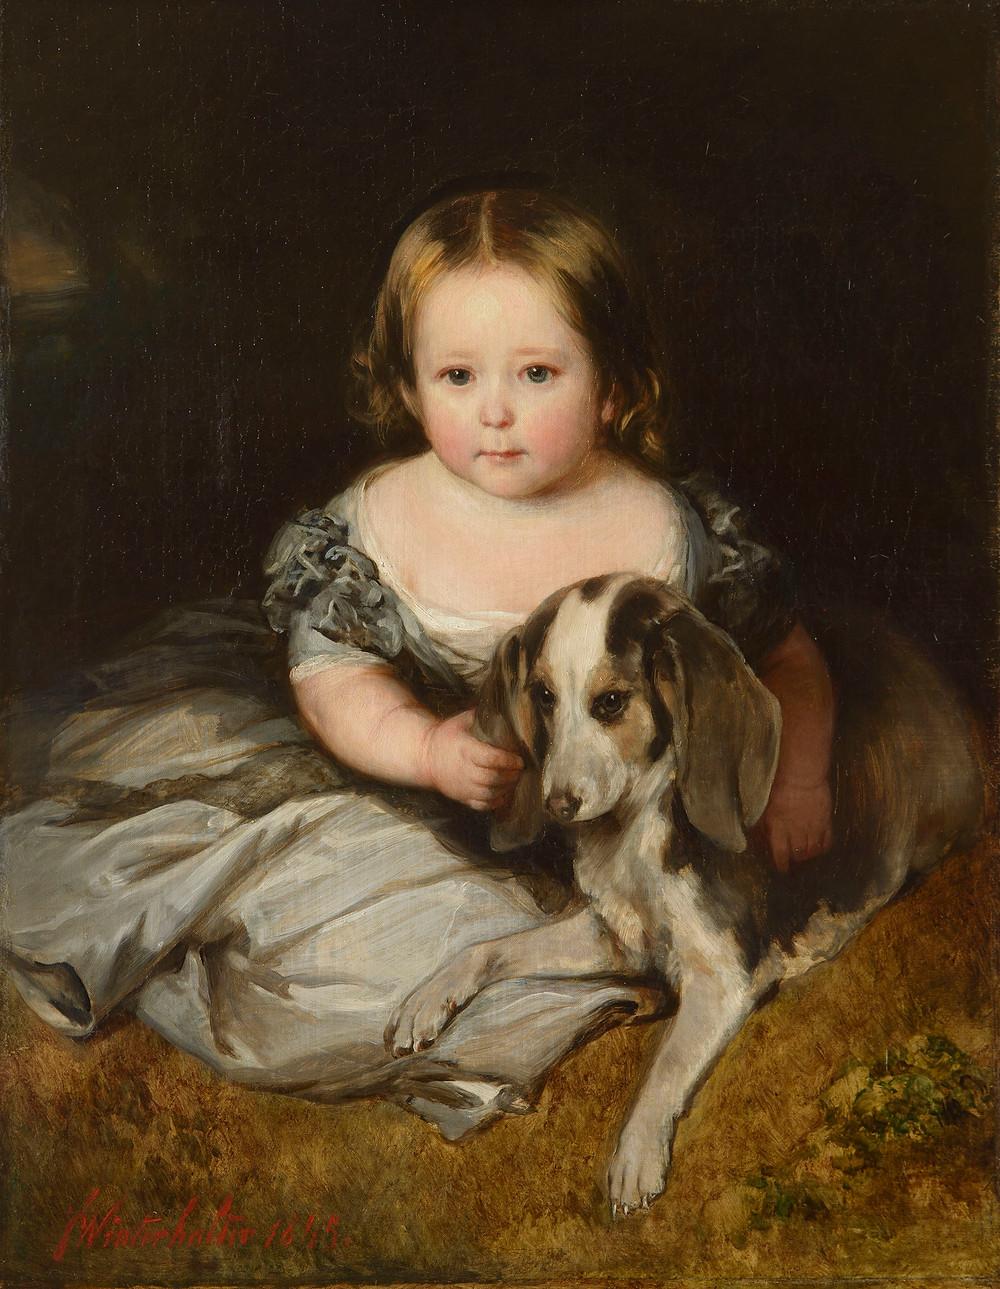 Princess Alice, by FRANZ XAVER WINTERHALTER 1845. Royal Collection Trust/© Her Majesty Queen Elizabeth II 2020